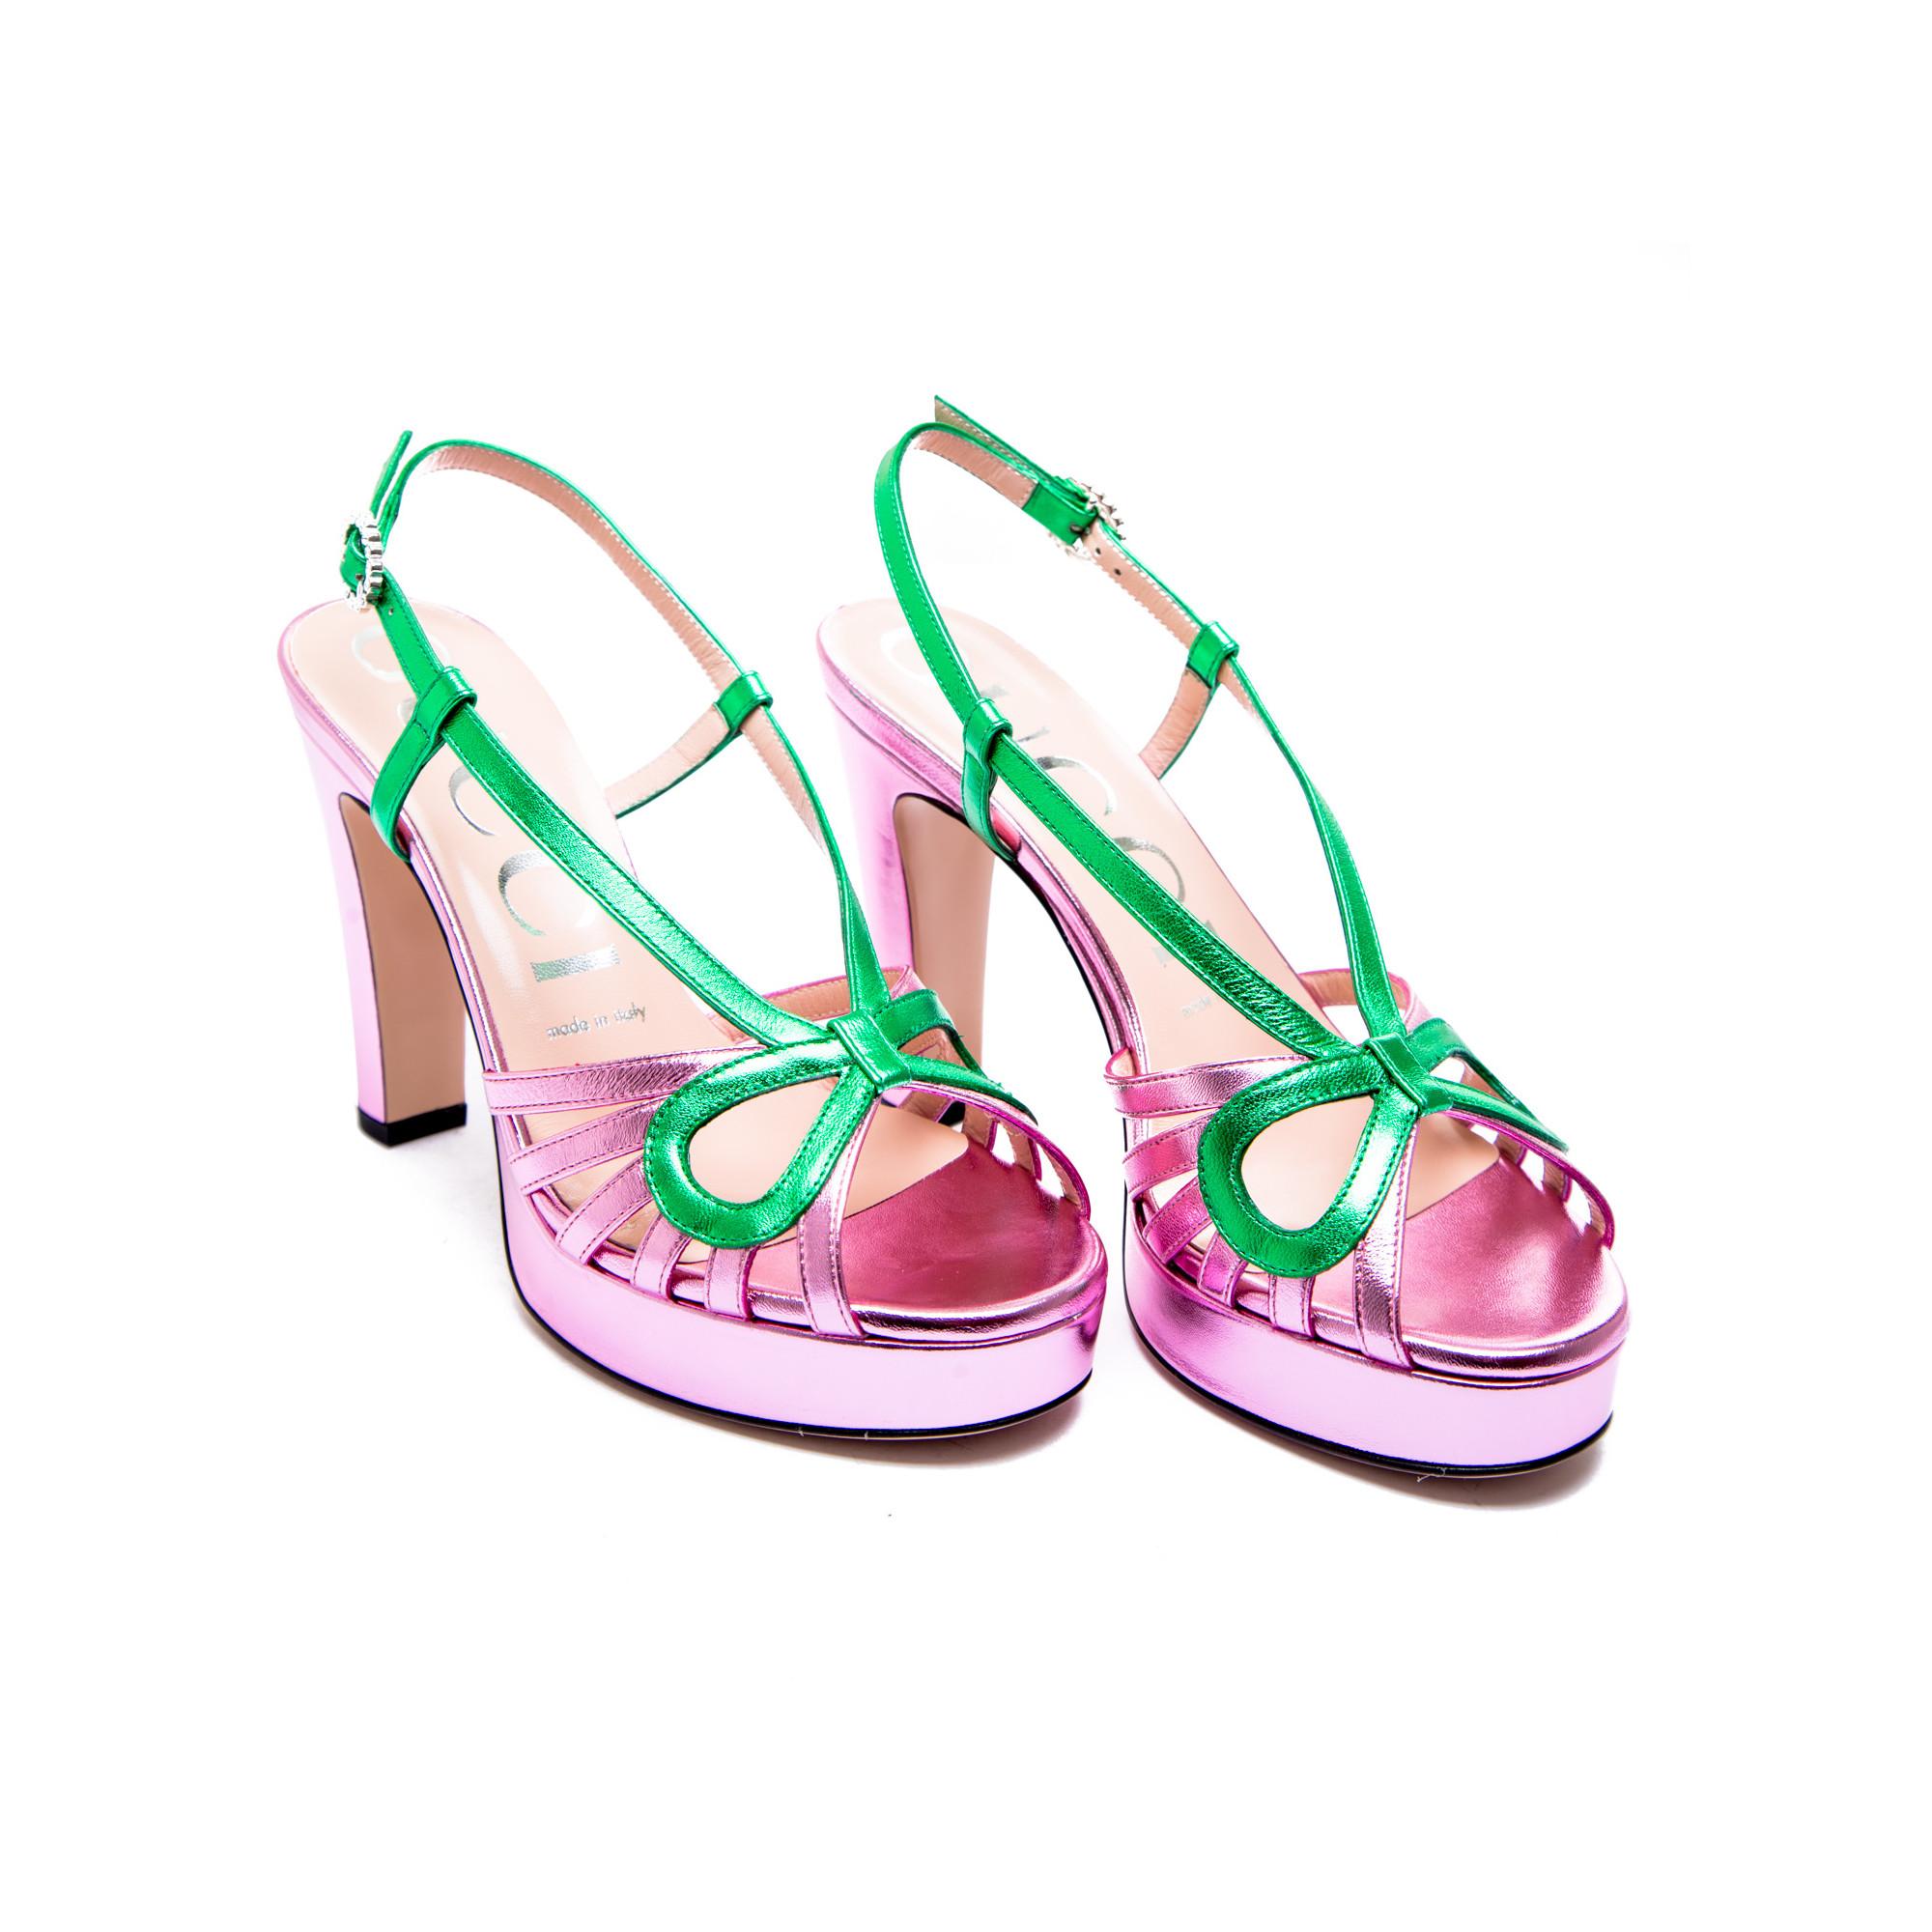 84a9505a3 ... Gucci sandals nappa silk Gucci sandals nappa silk - www.derodeloper.com  - Derodeloper ...